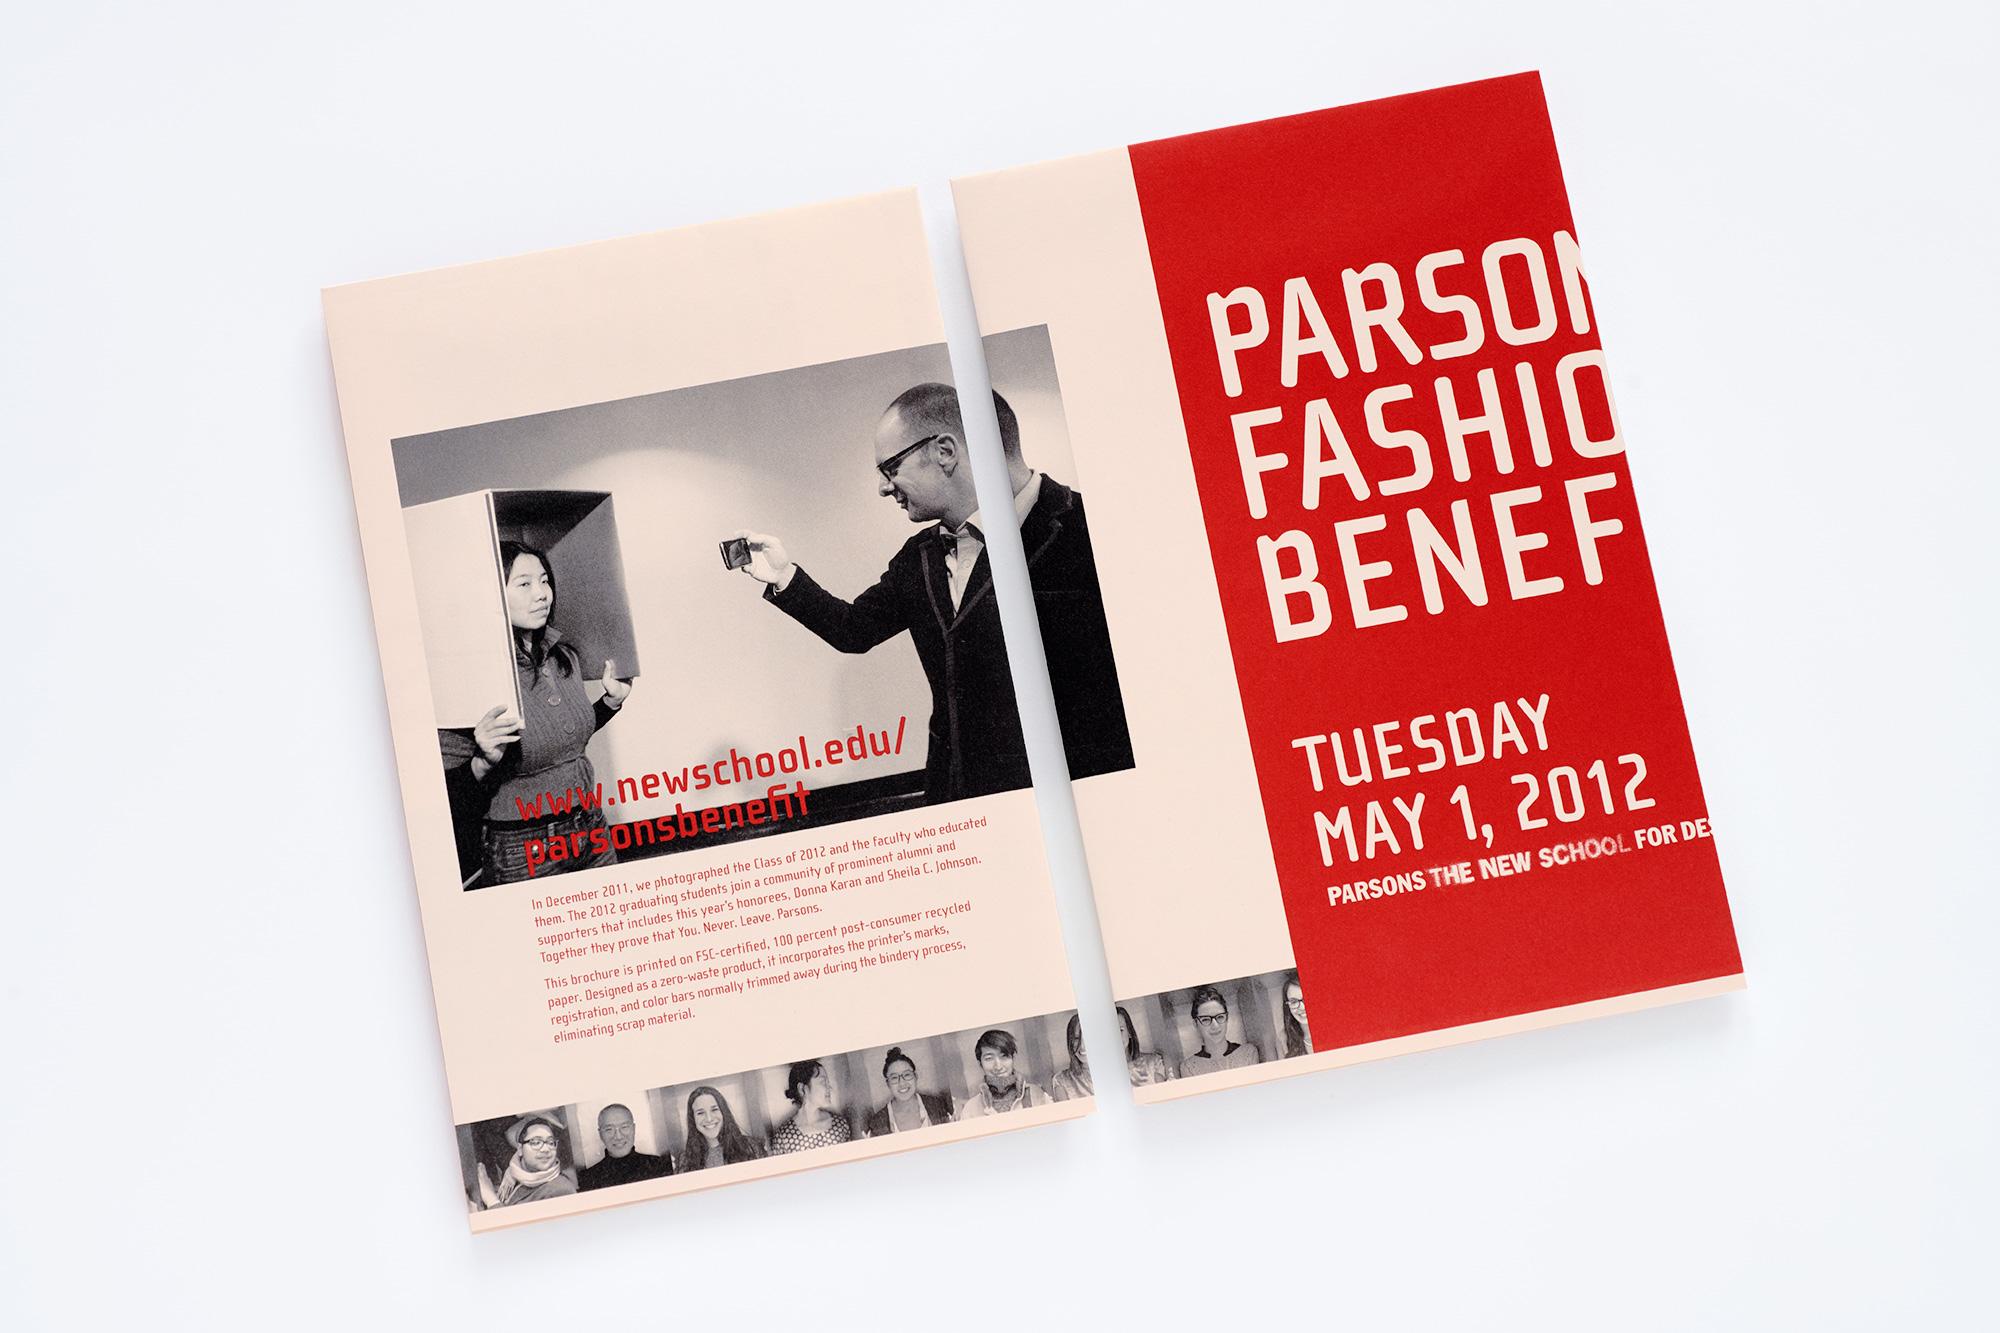 Paula_Giraldo_Parsons_Fashion_Benefit_1.jpg